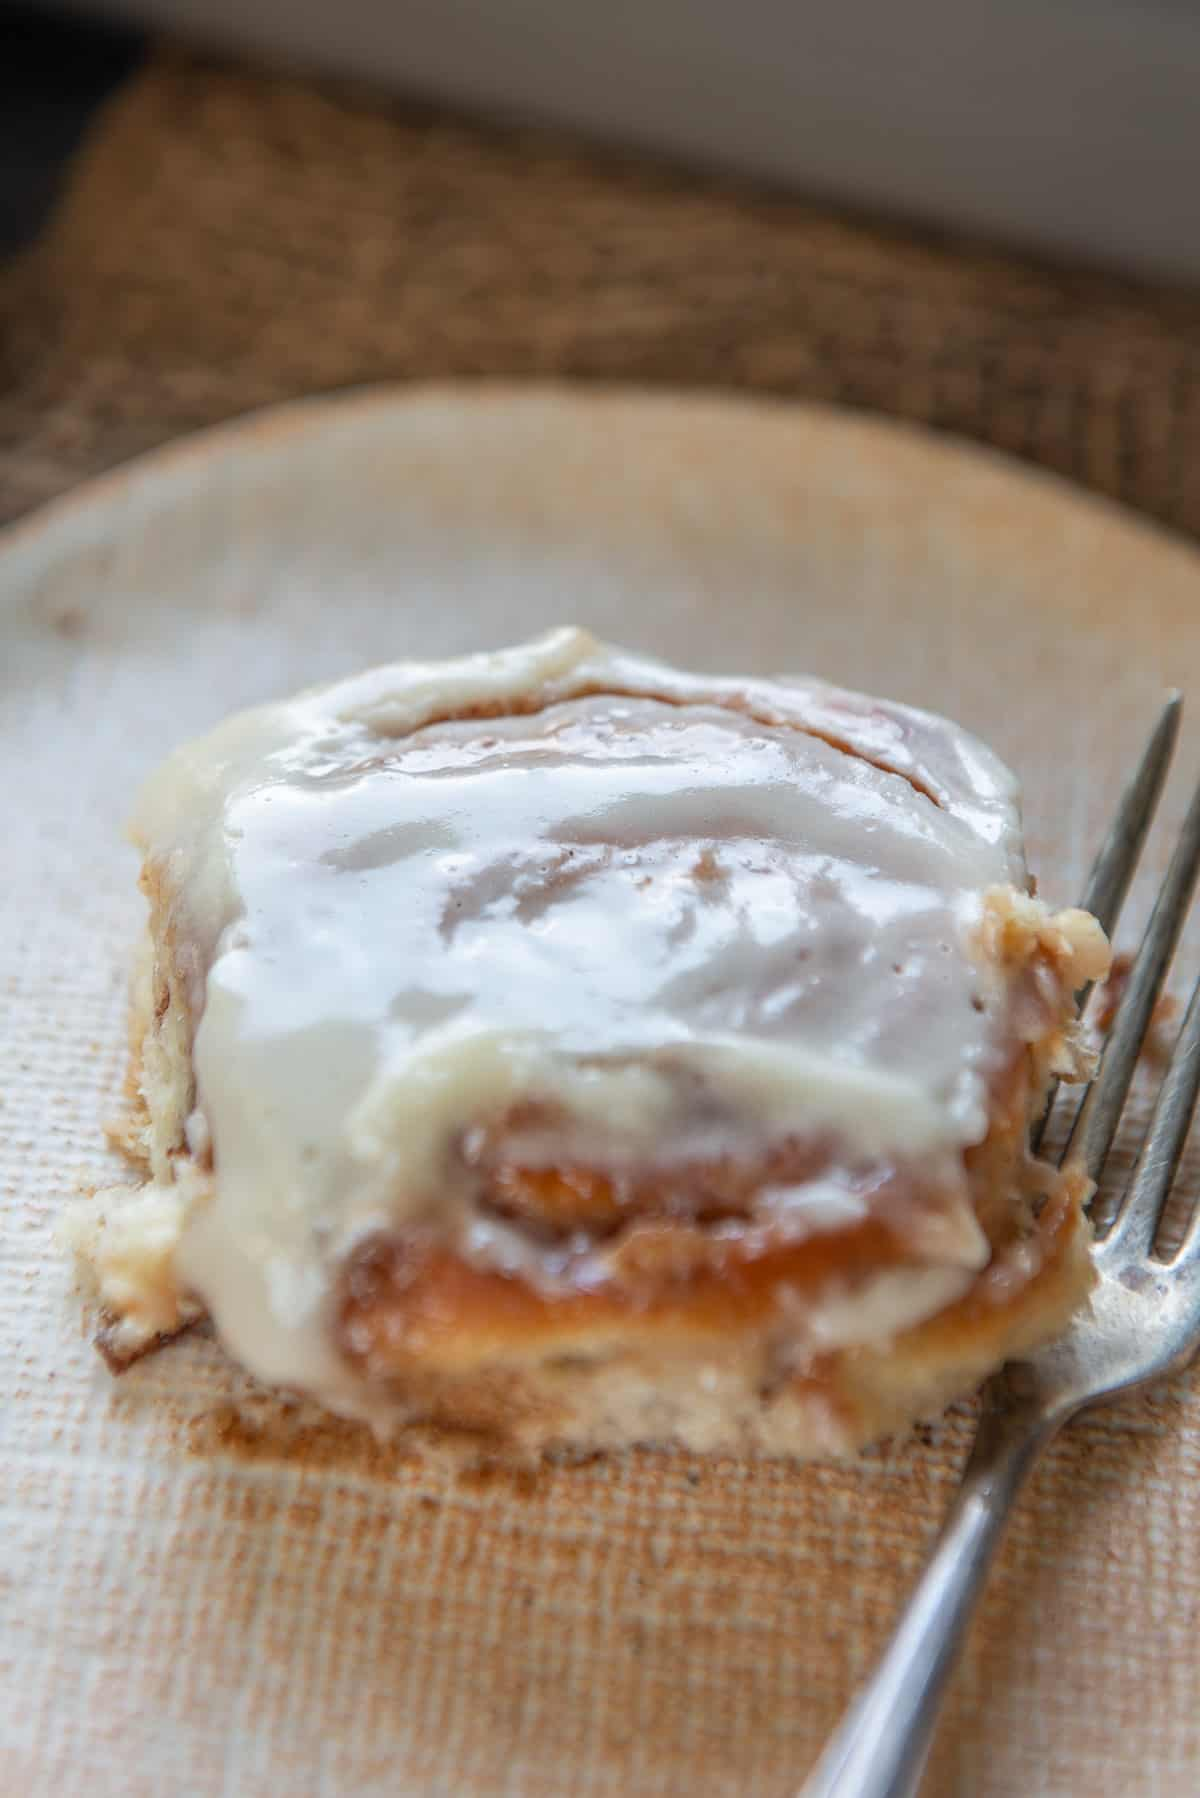 Cinnamon roll served on a plate.